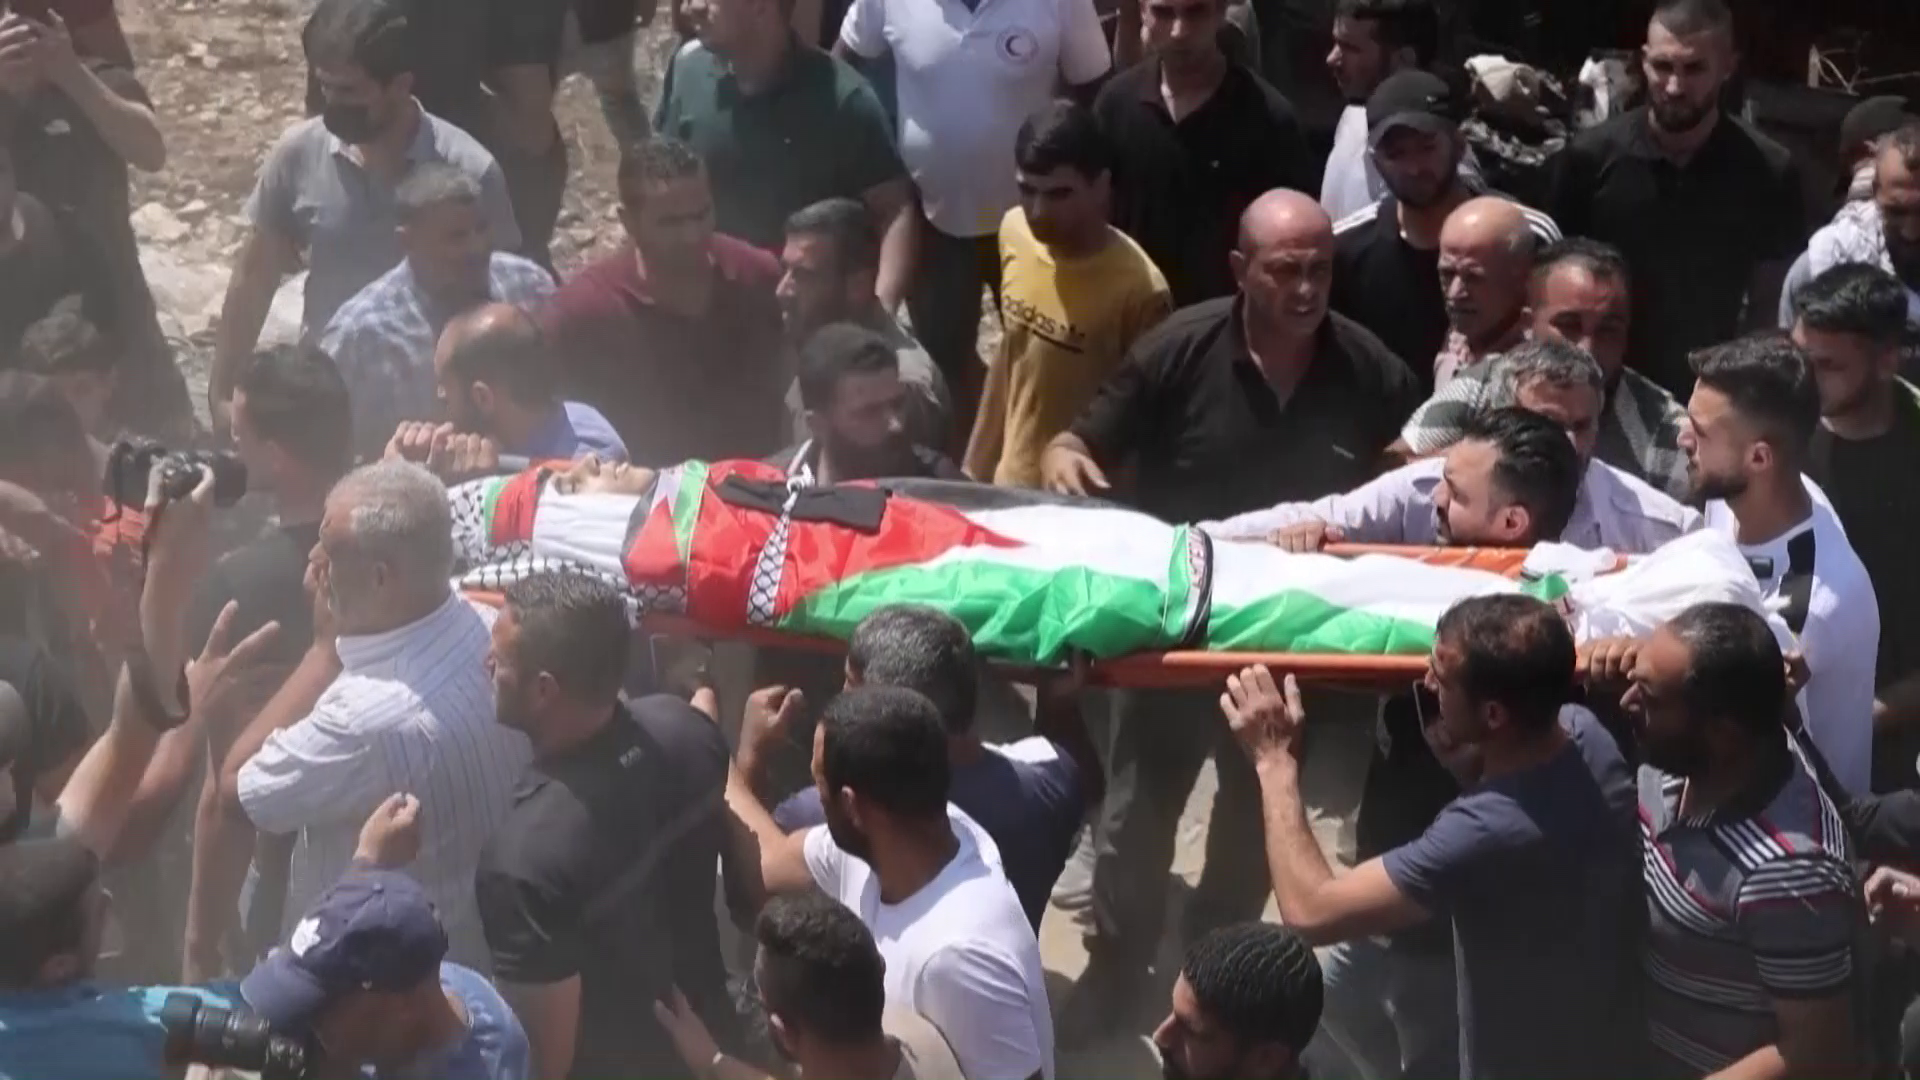 Palestinians bury man shot by Israeli soldiers in West Bank